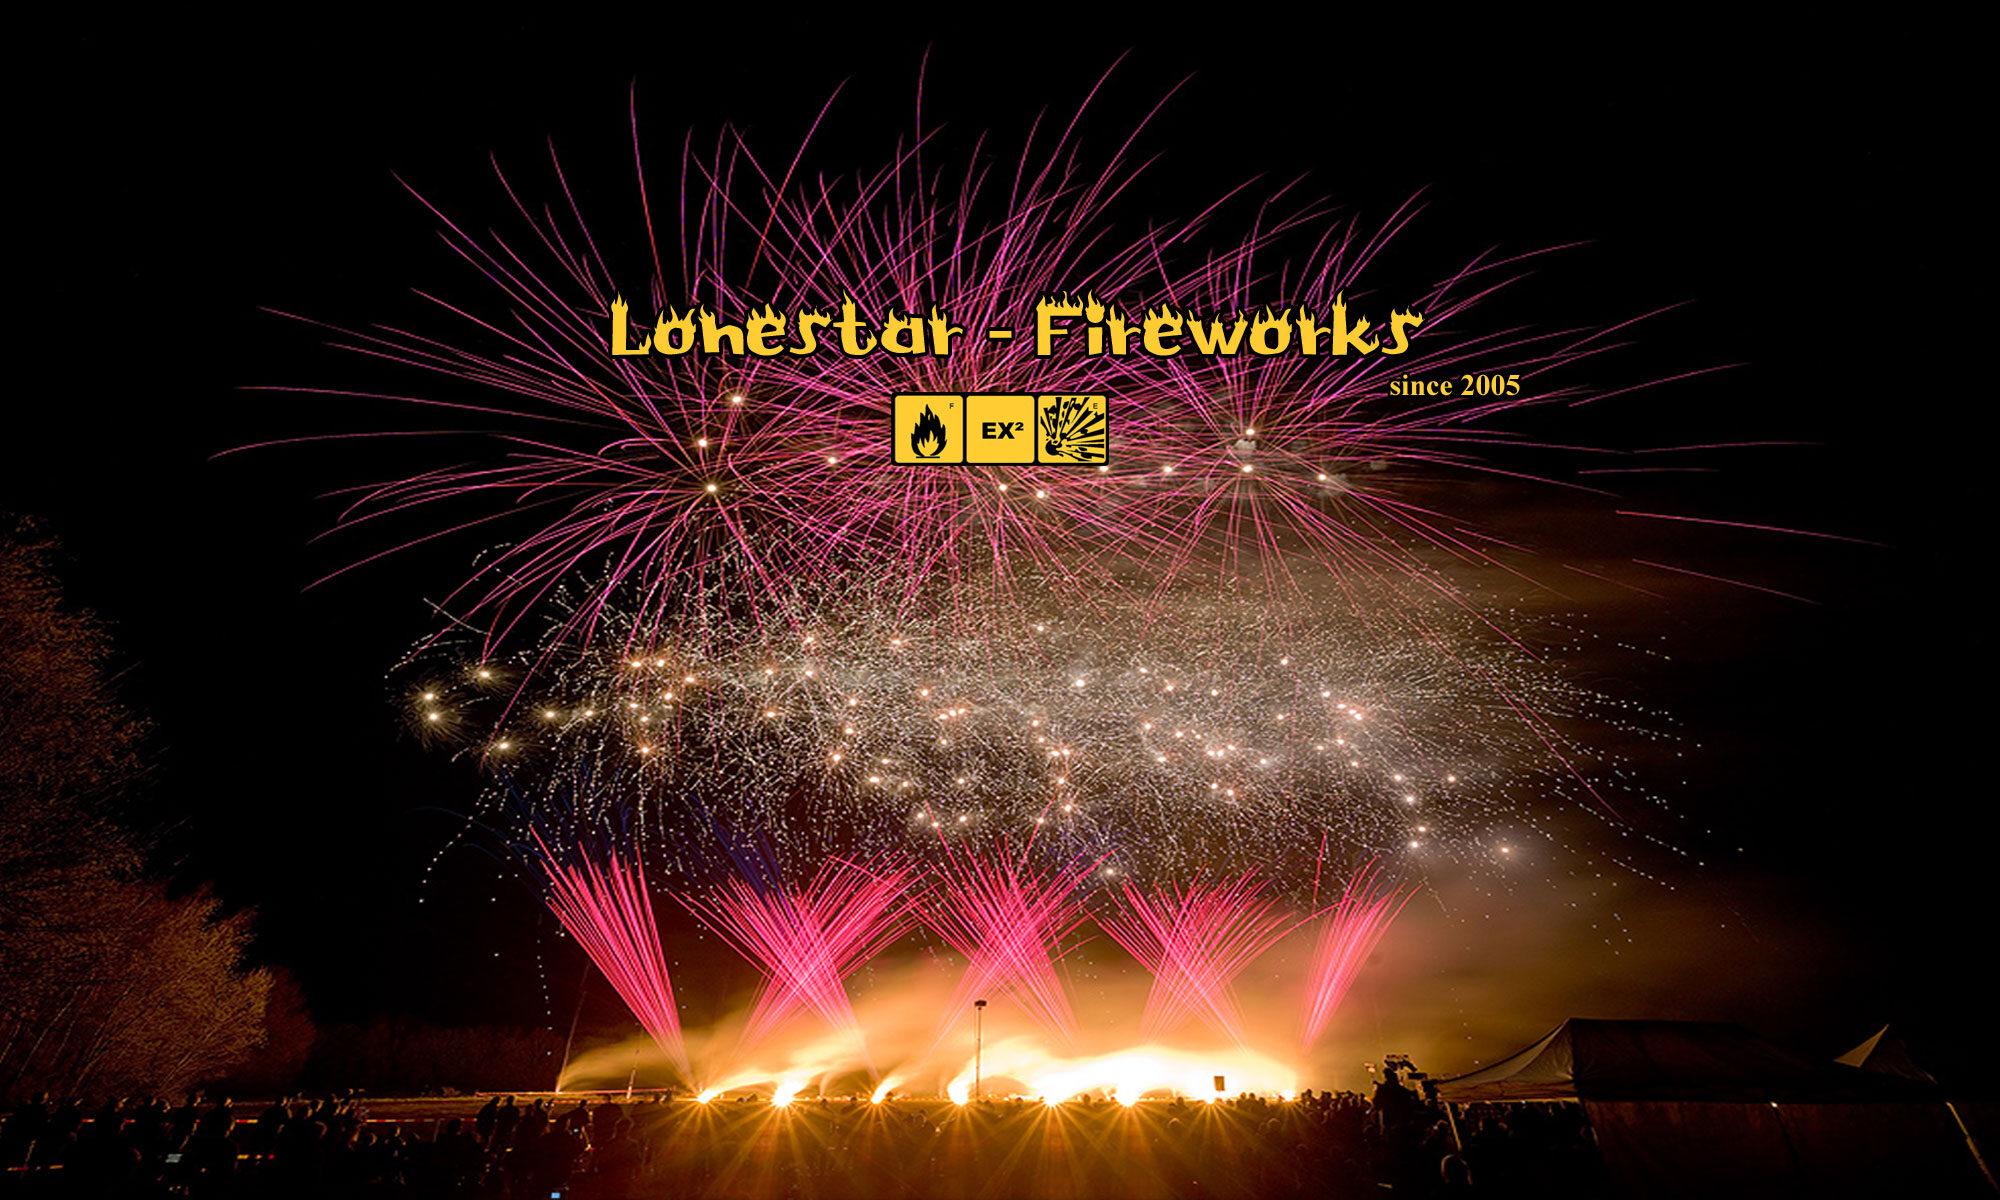 Lonestar-Fireworks GmbH